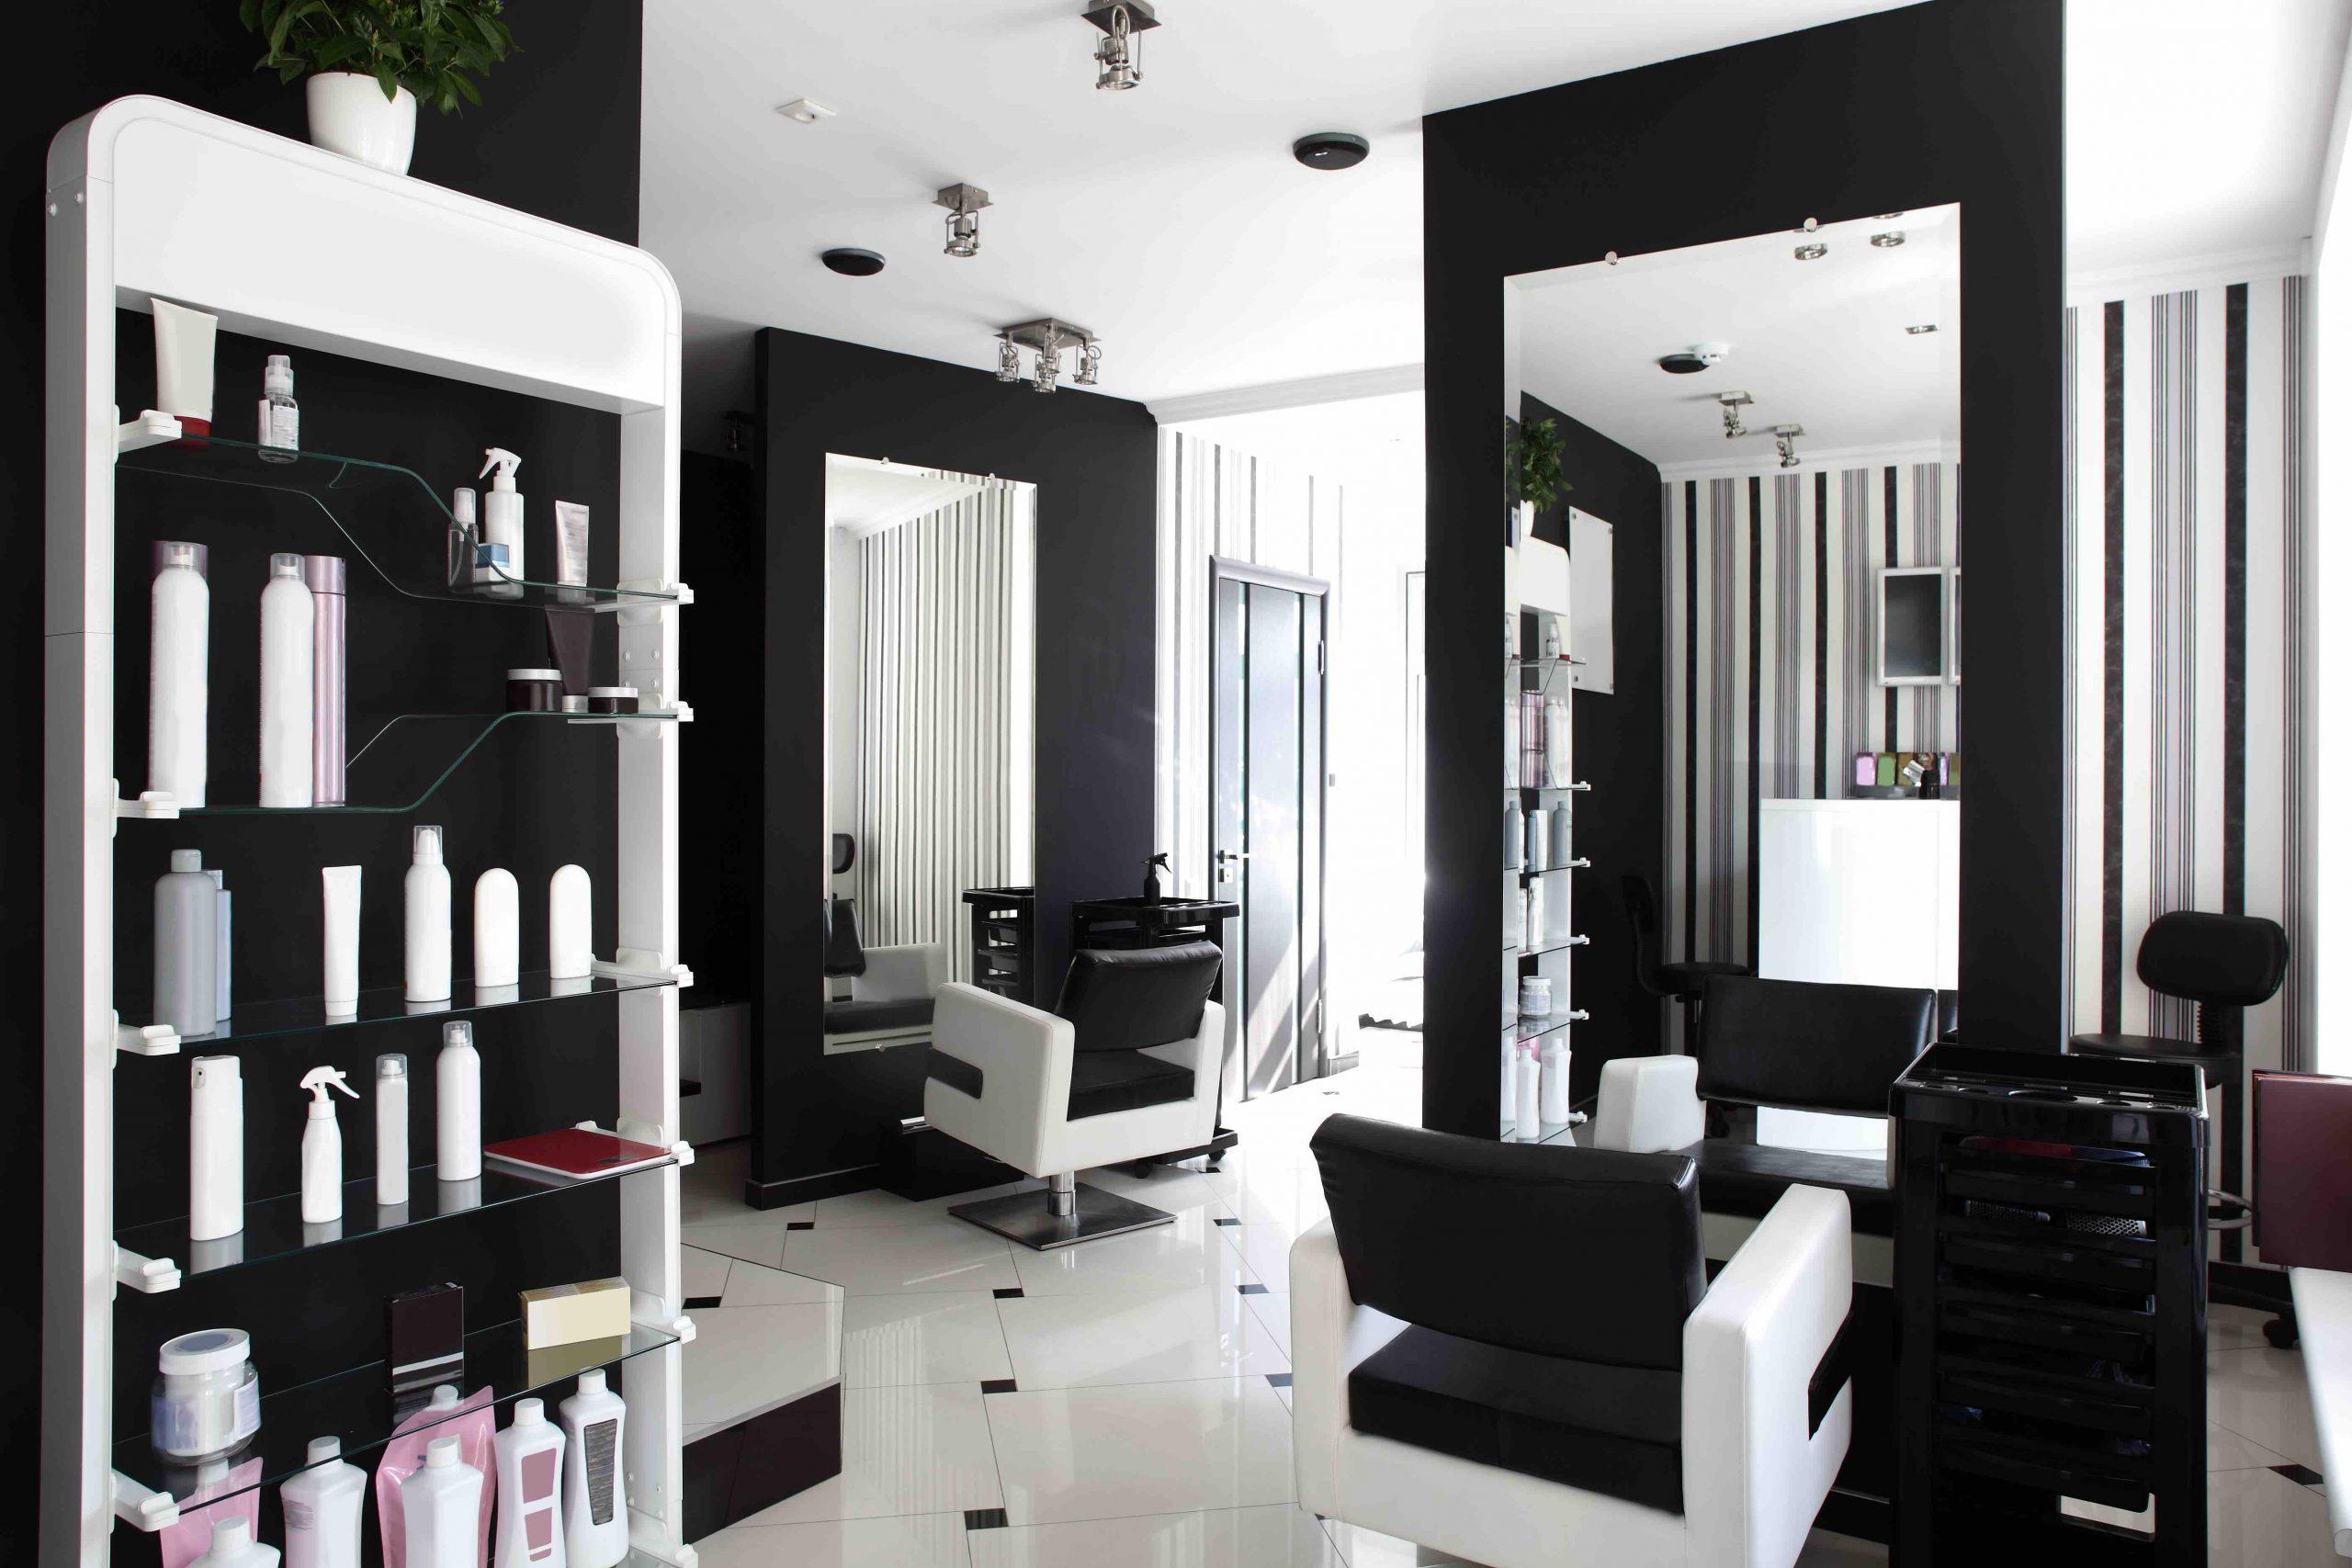 Hair salon Occupyd